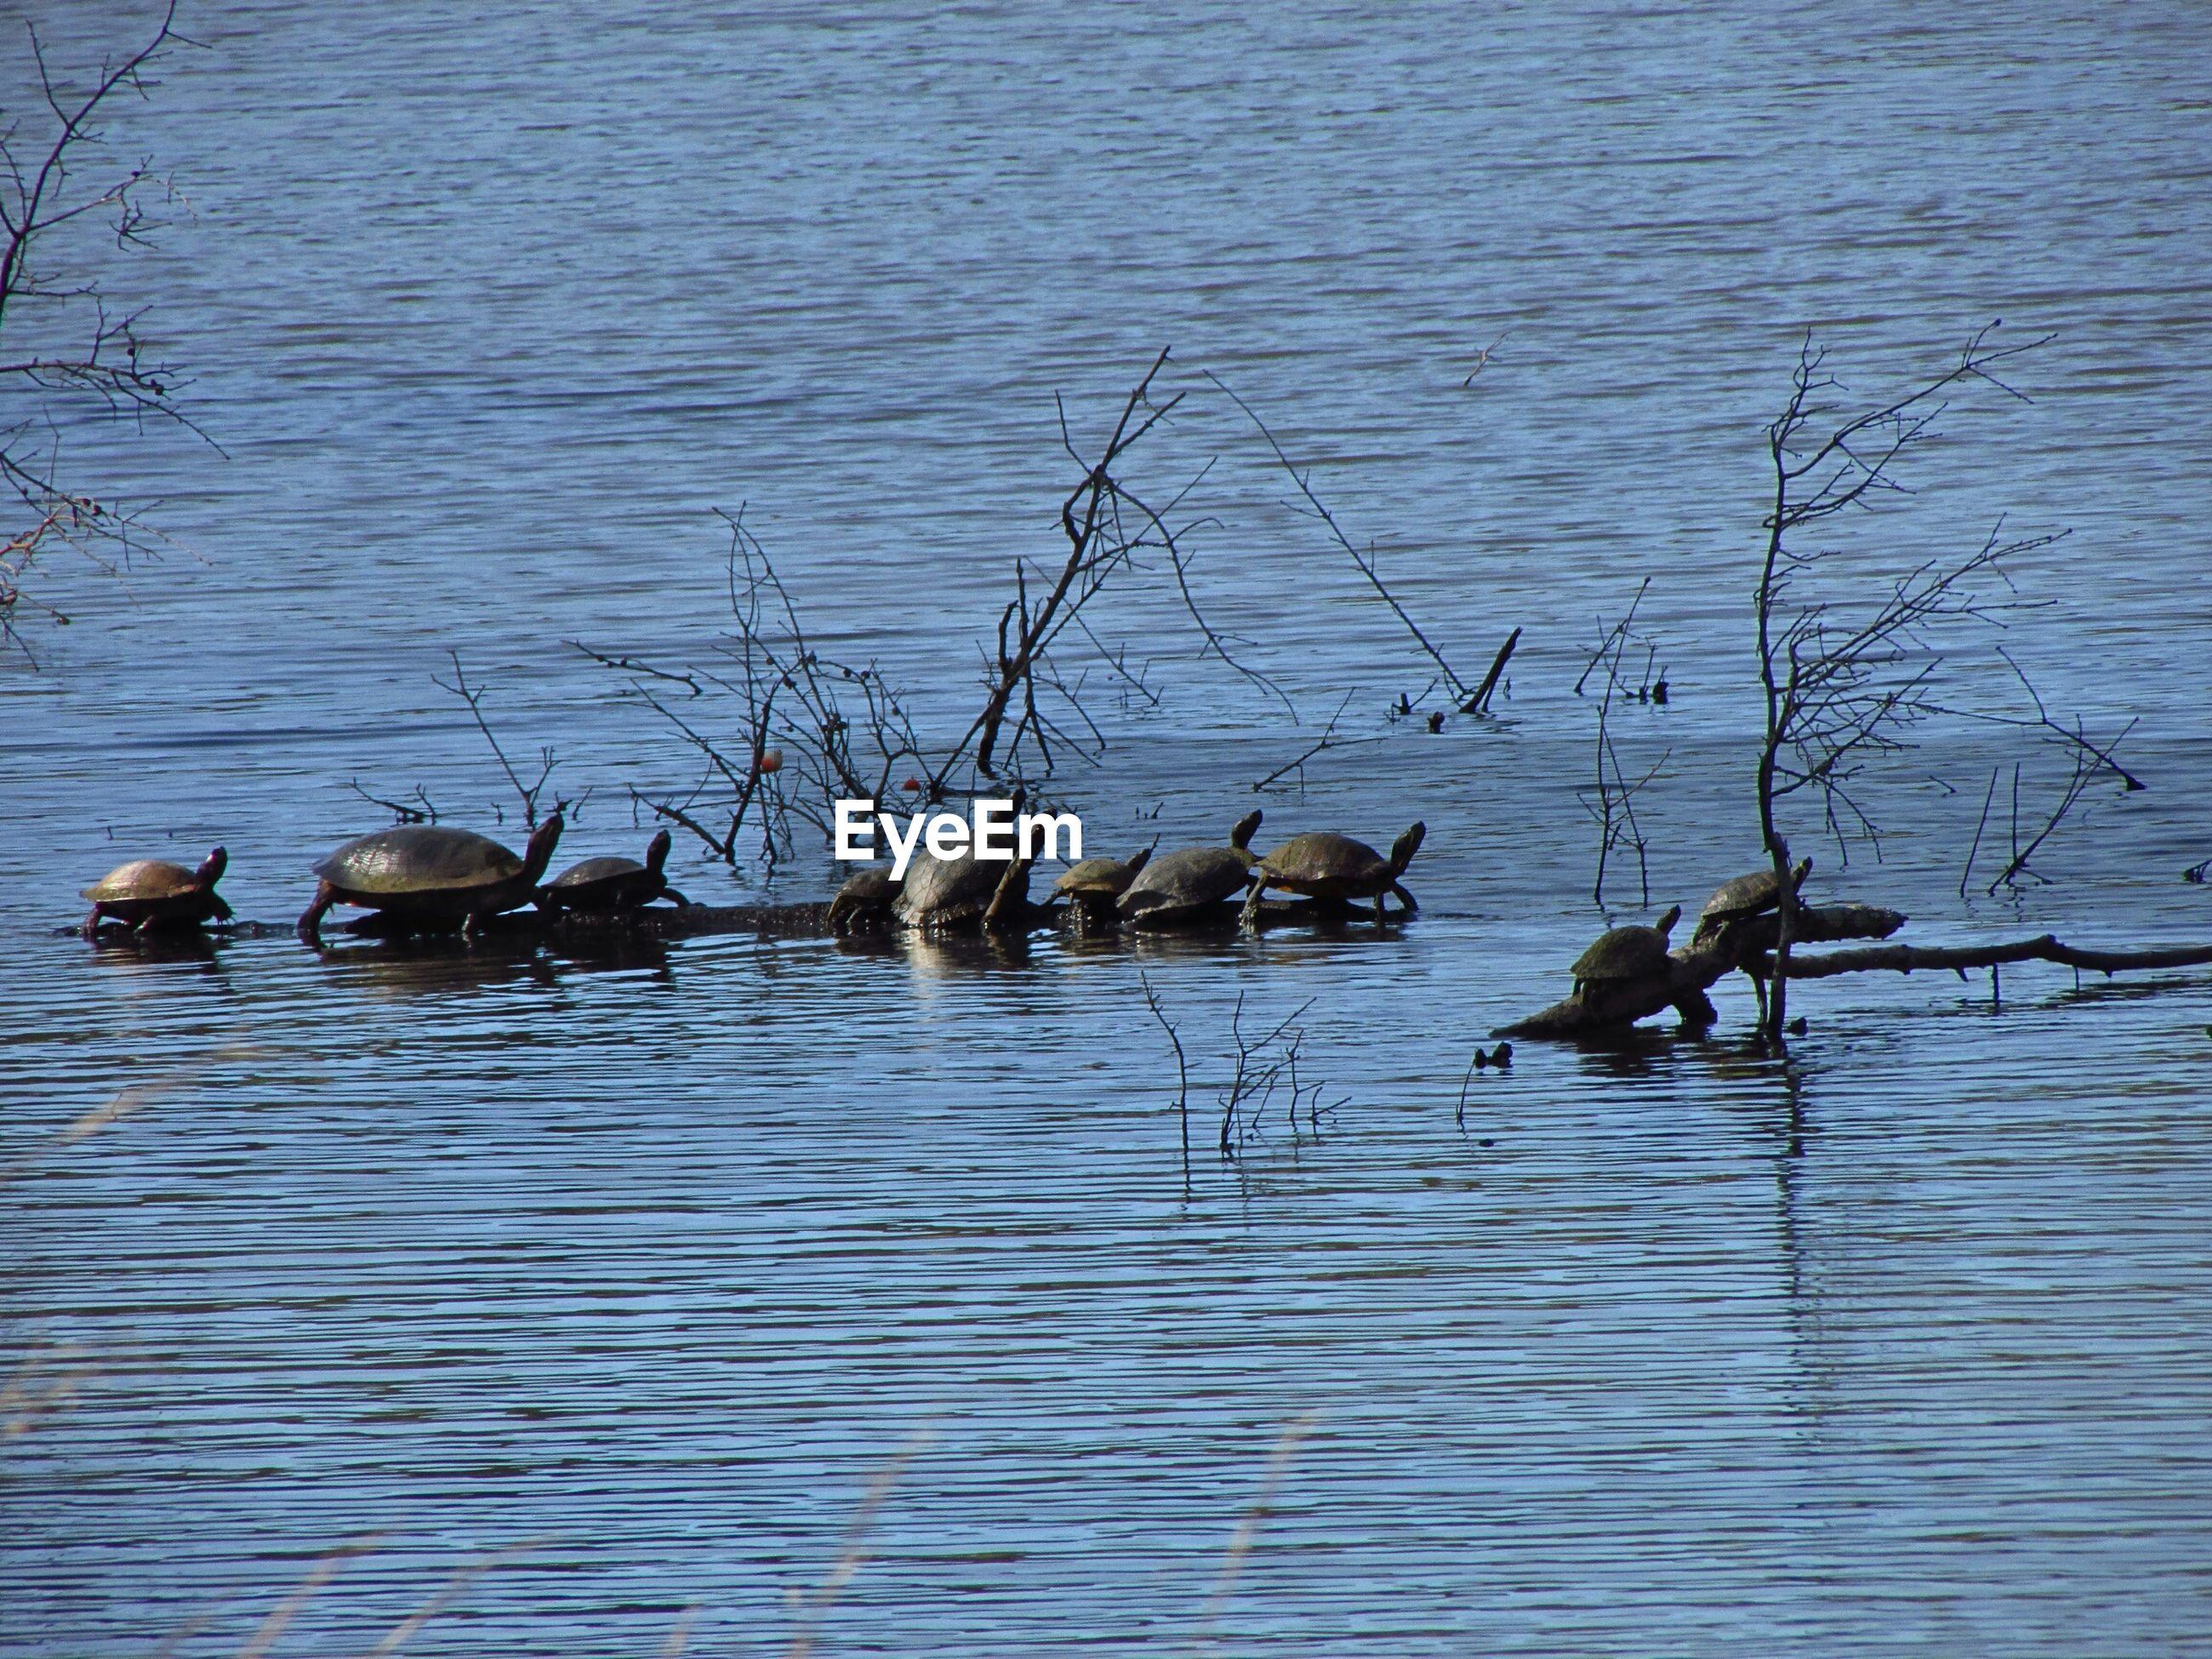 Turtles on driftwood amidst lake